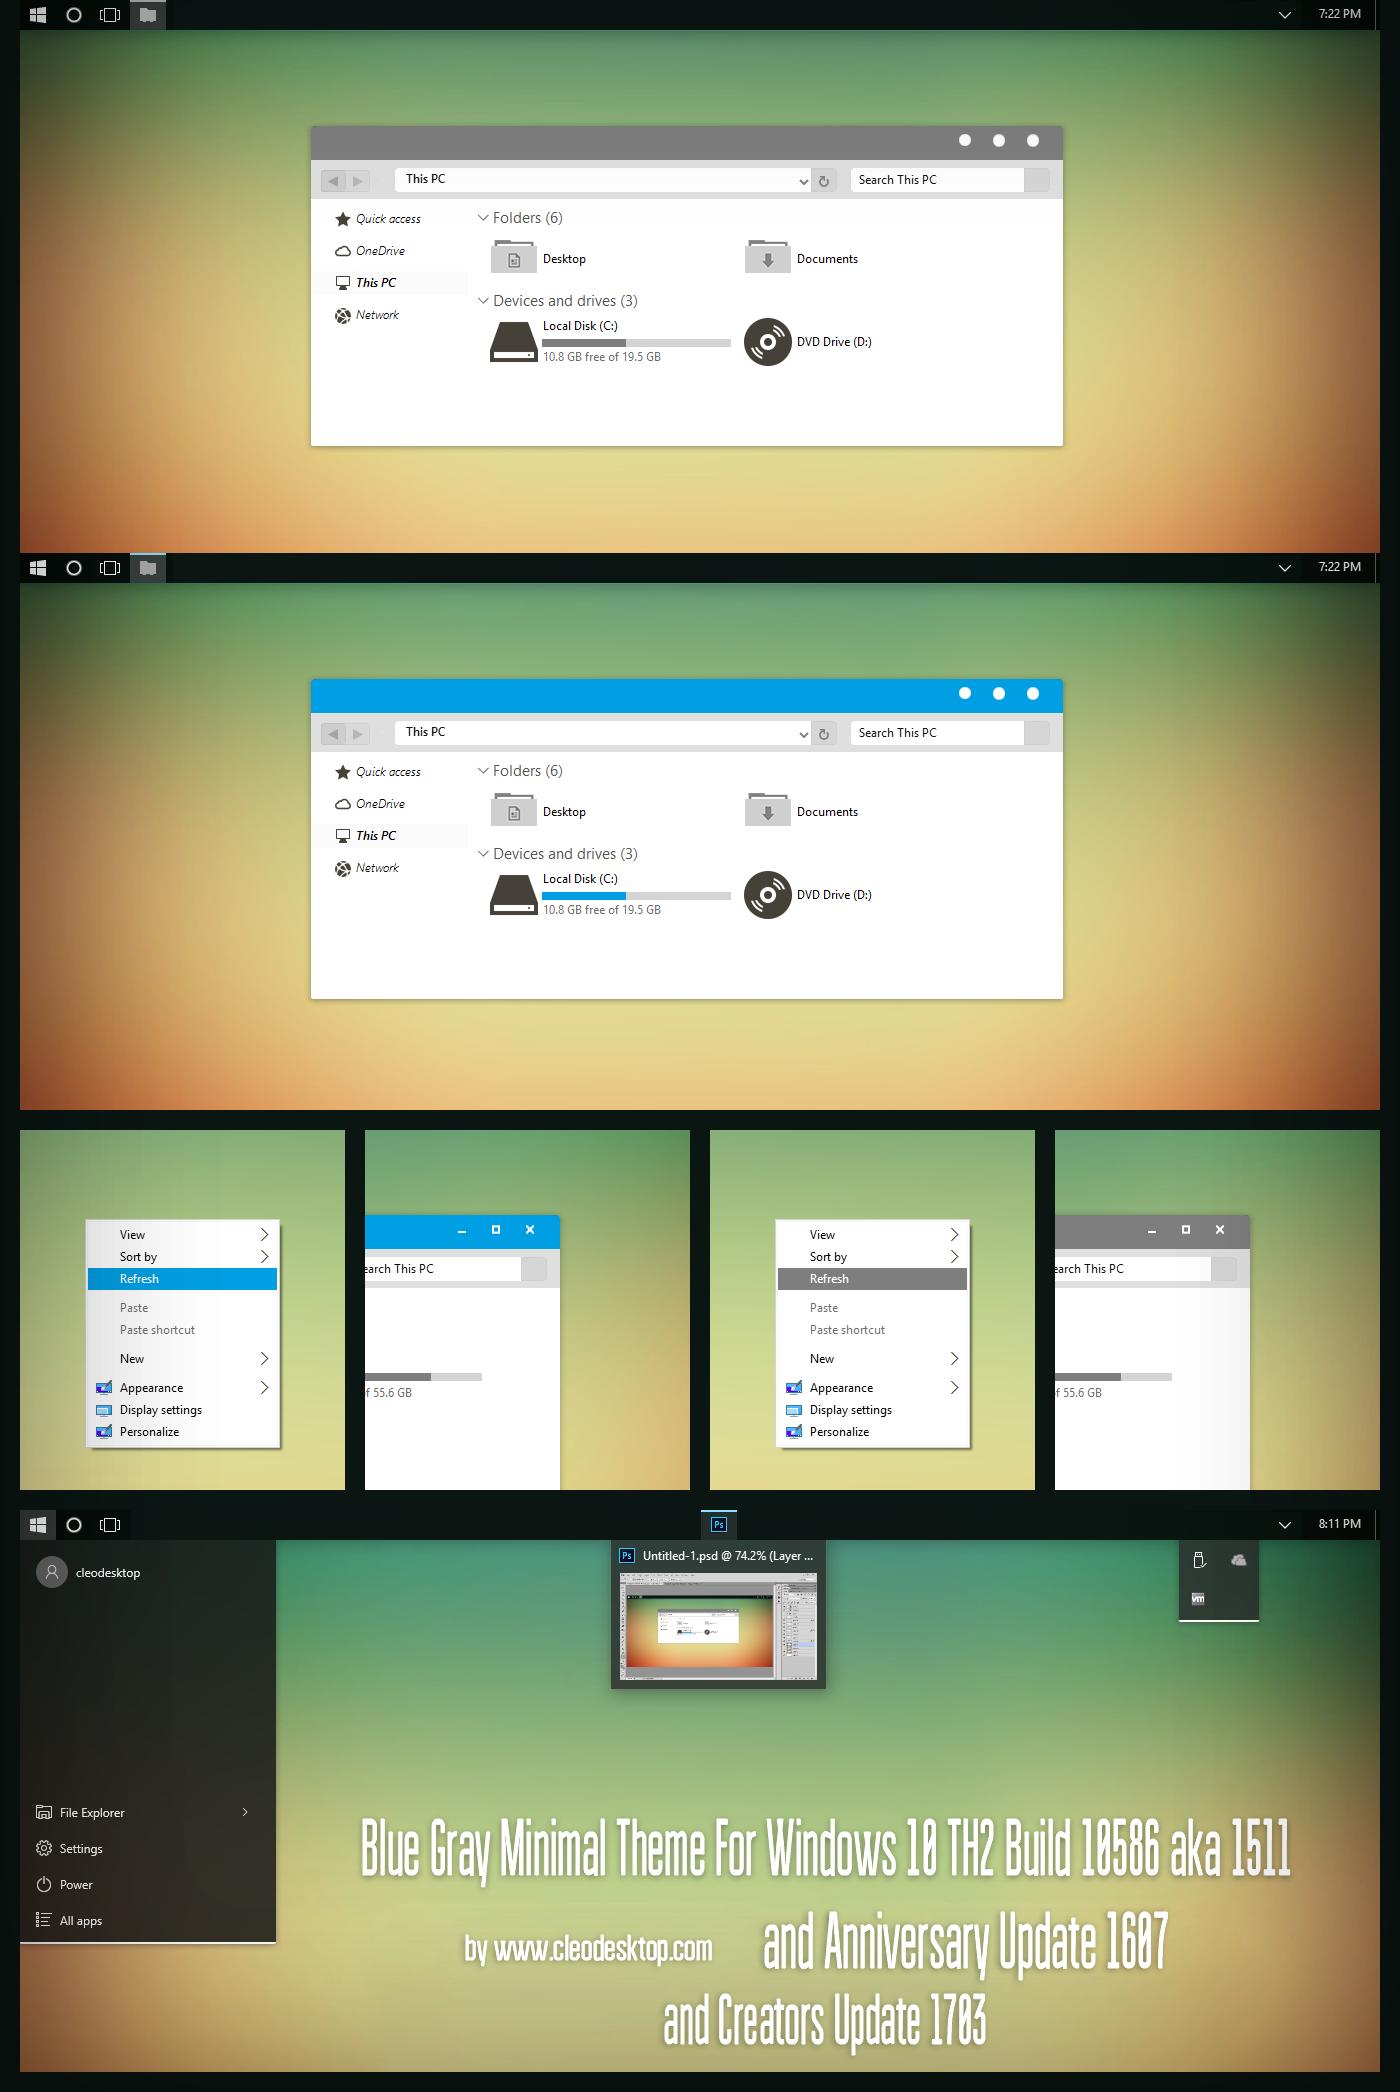 Blue Gray Minimal Theme Win10 Creators Update by Cleodesktop